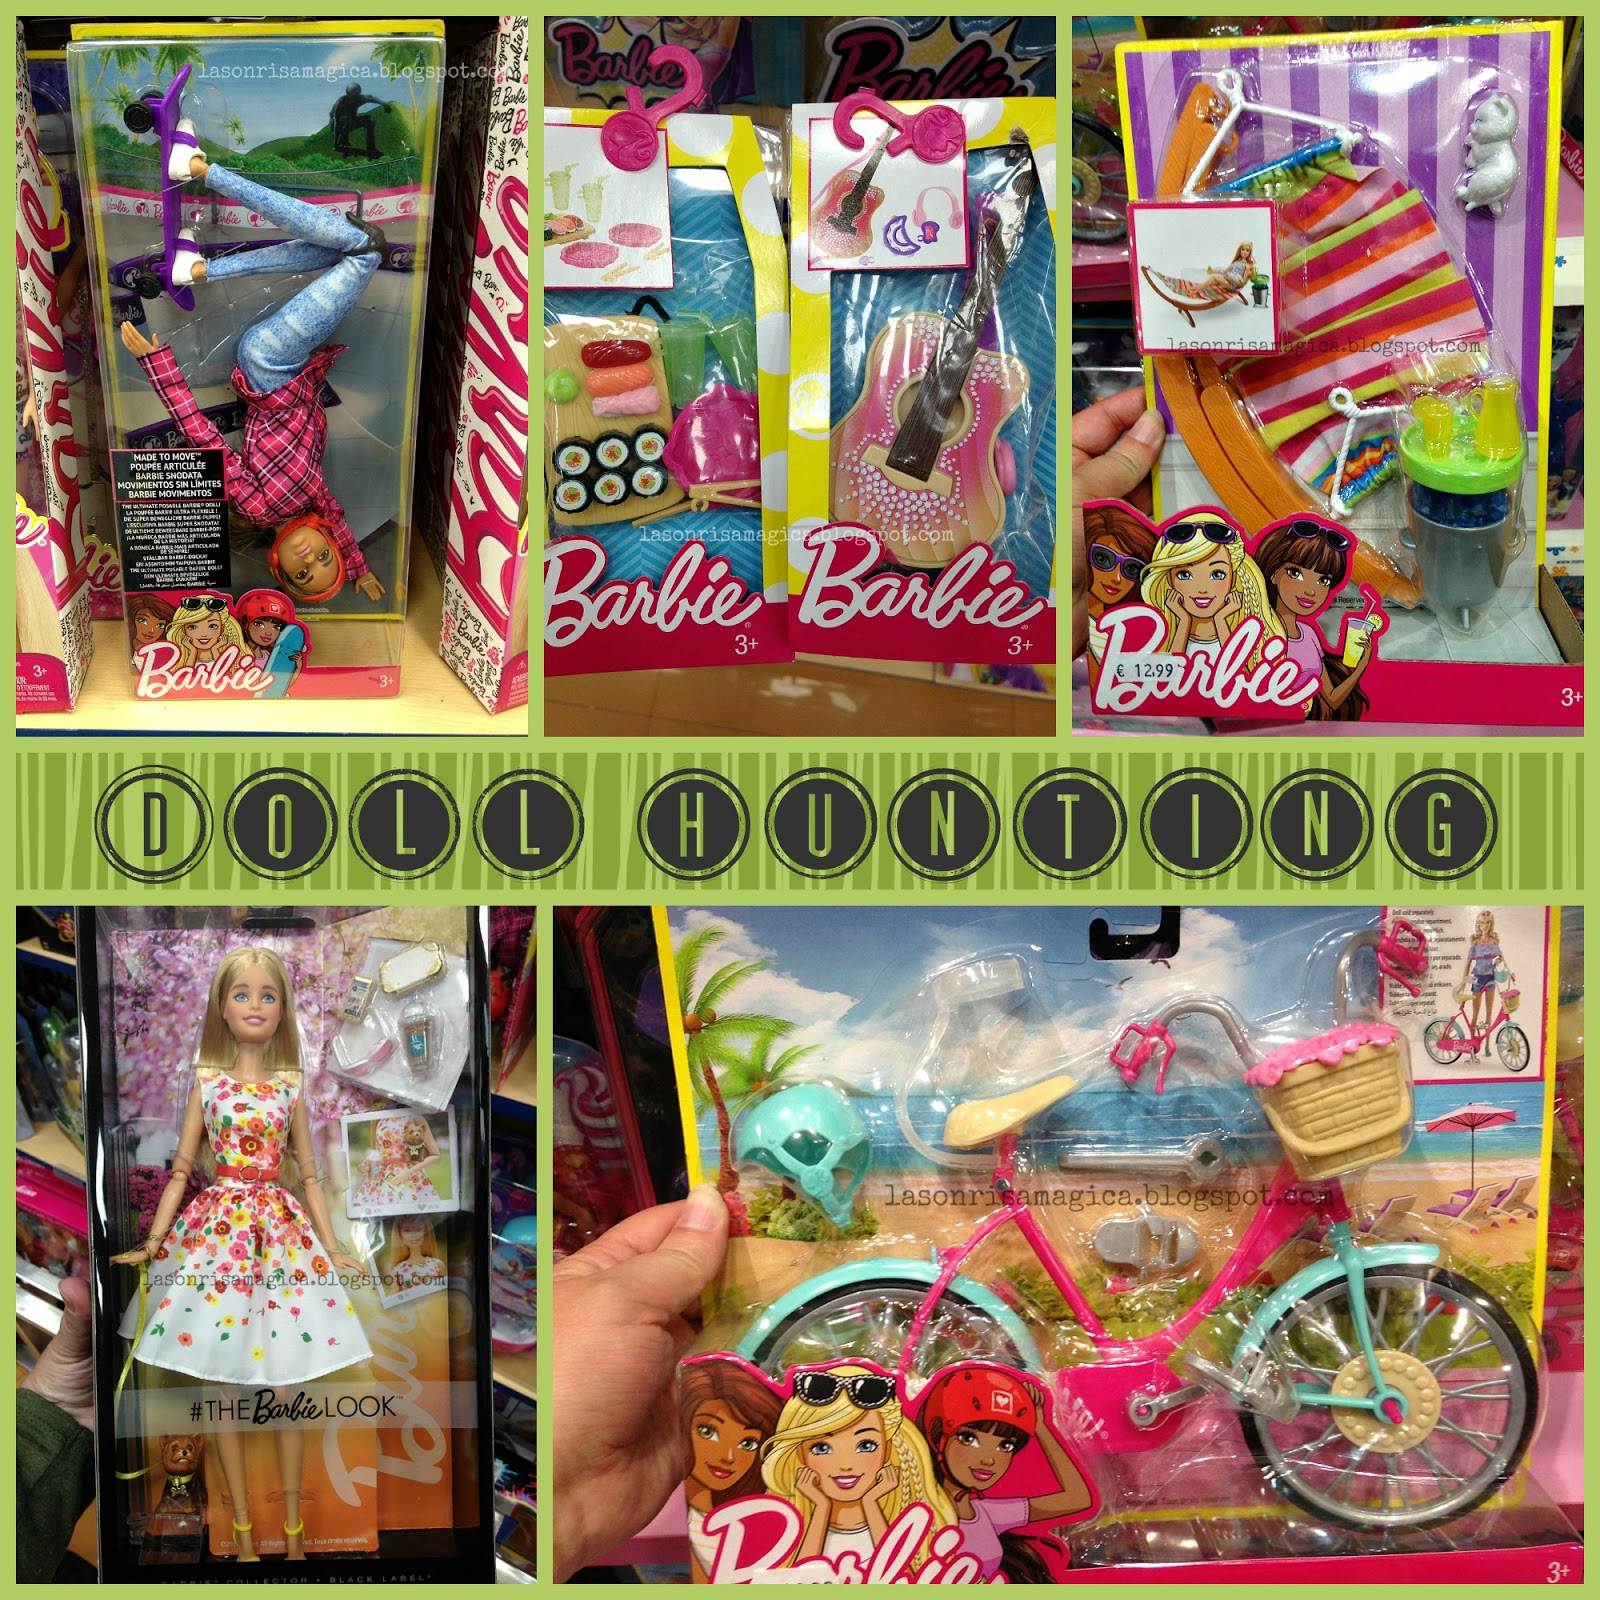 La Sonrisa Mágica: Spring doll hunting! Barbie Collector, Playline ...